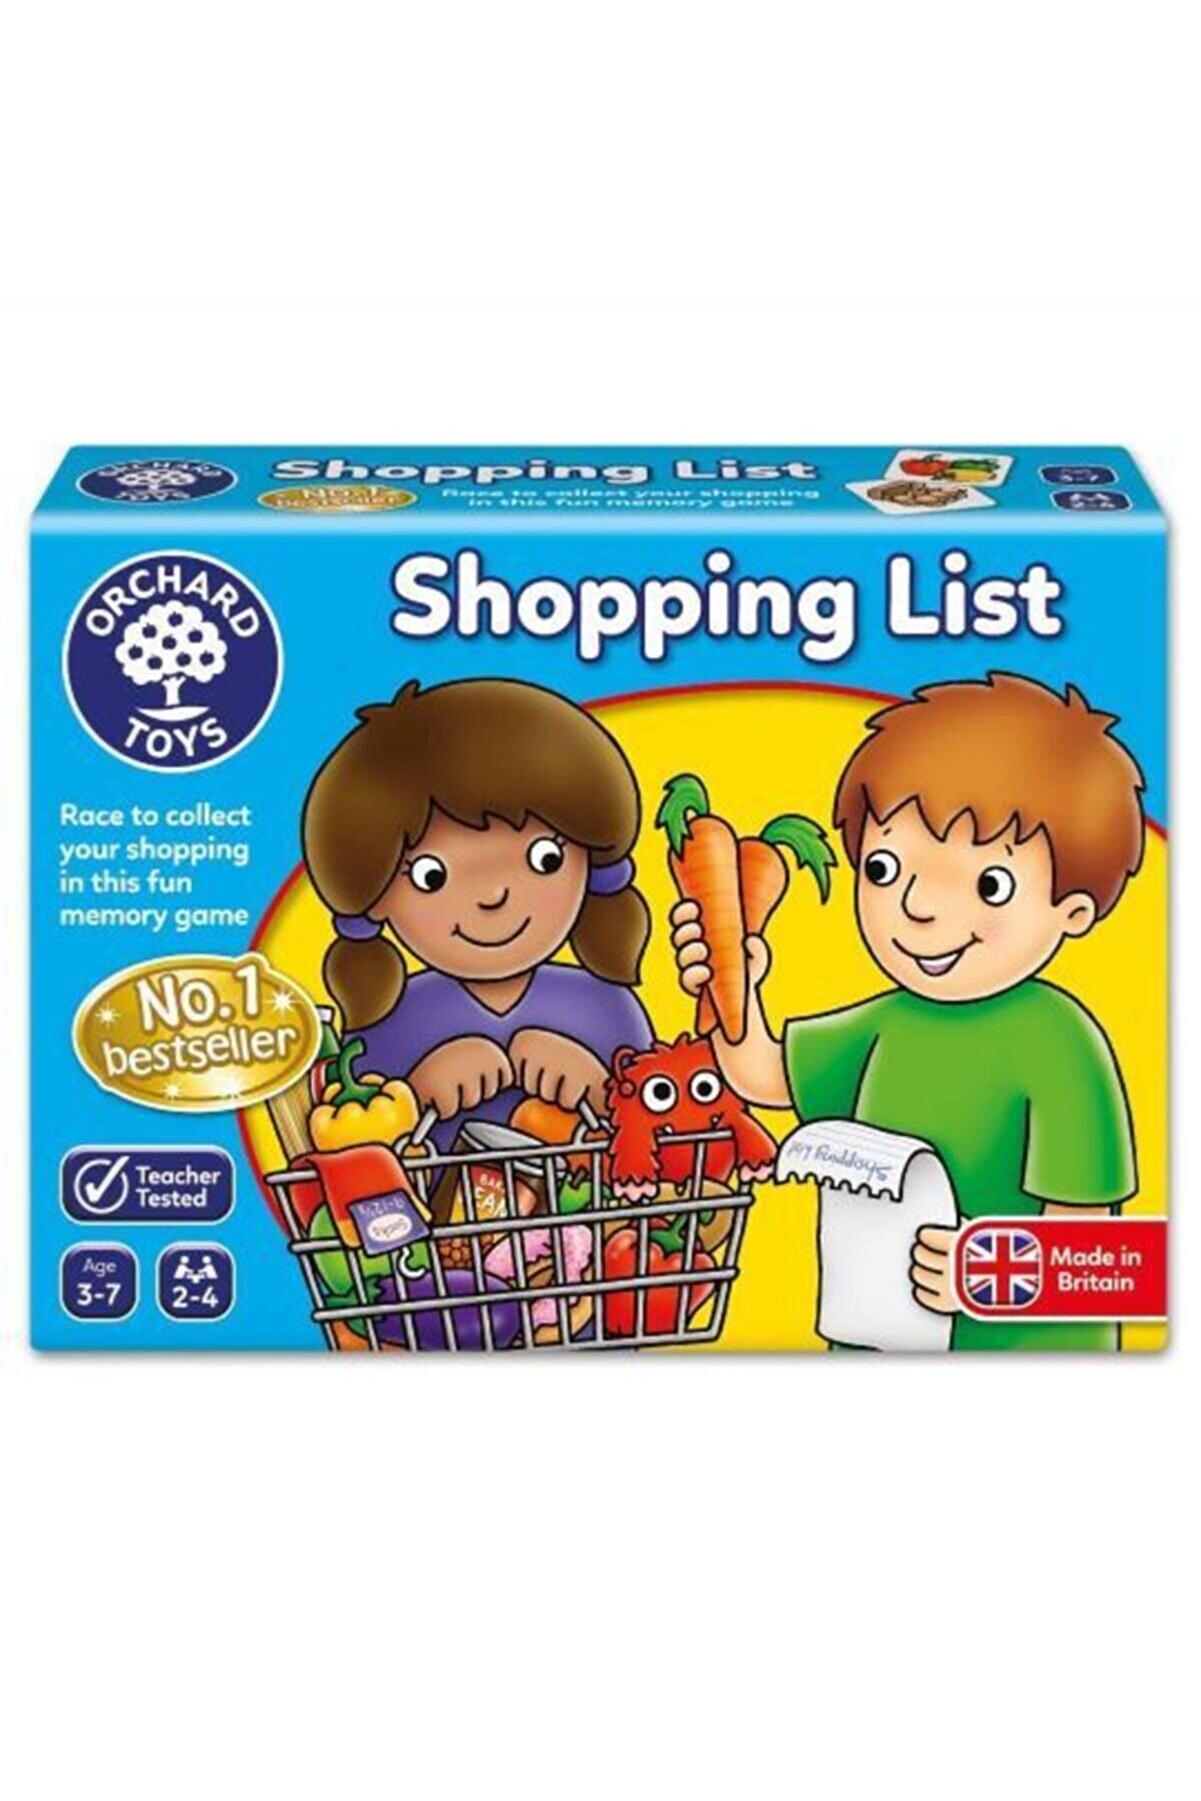 ORCHARD Shopping List 3 - 7 Alışveriş Listesi Oyunu